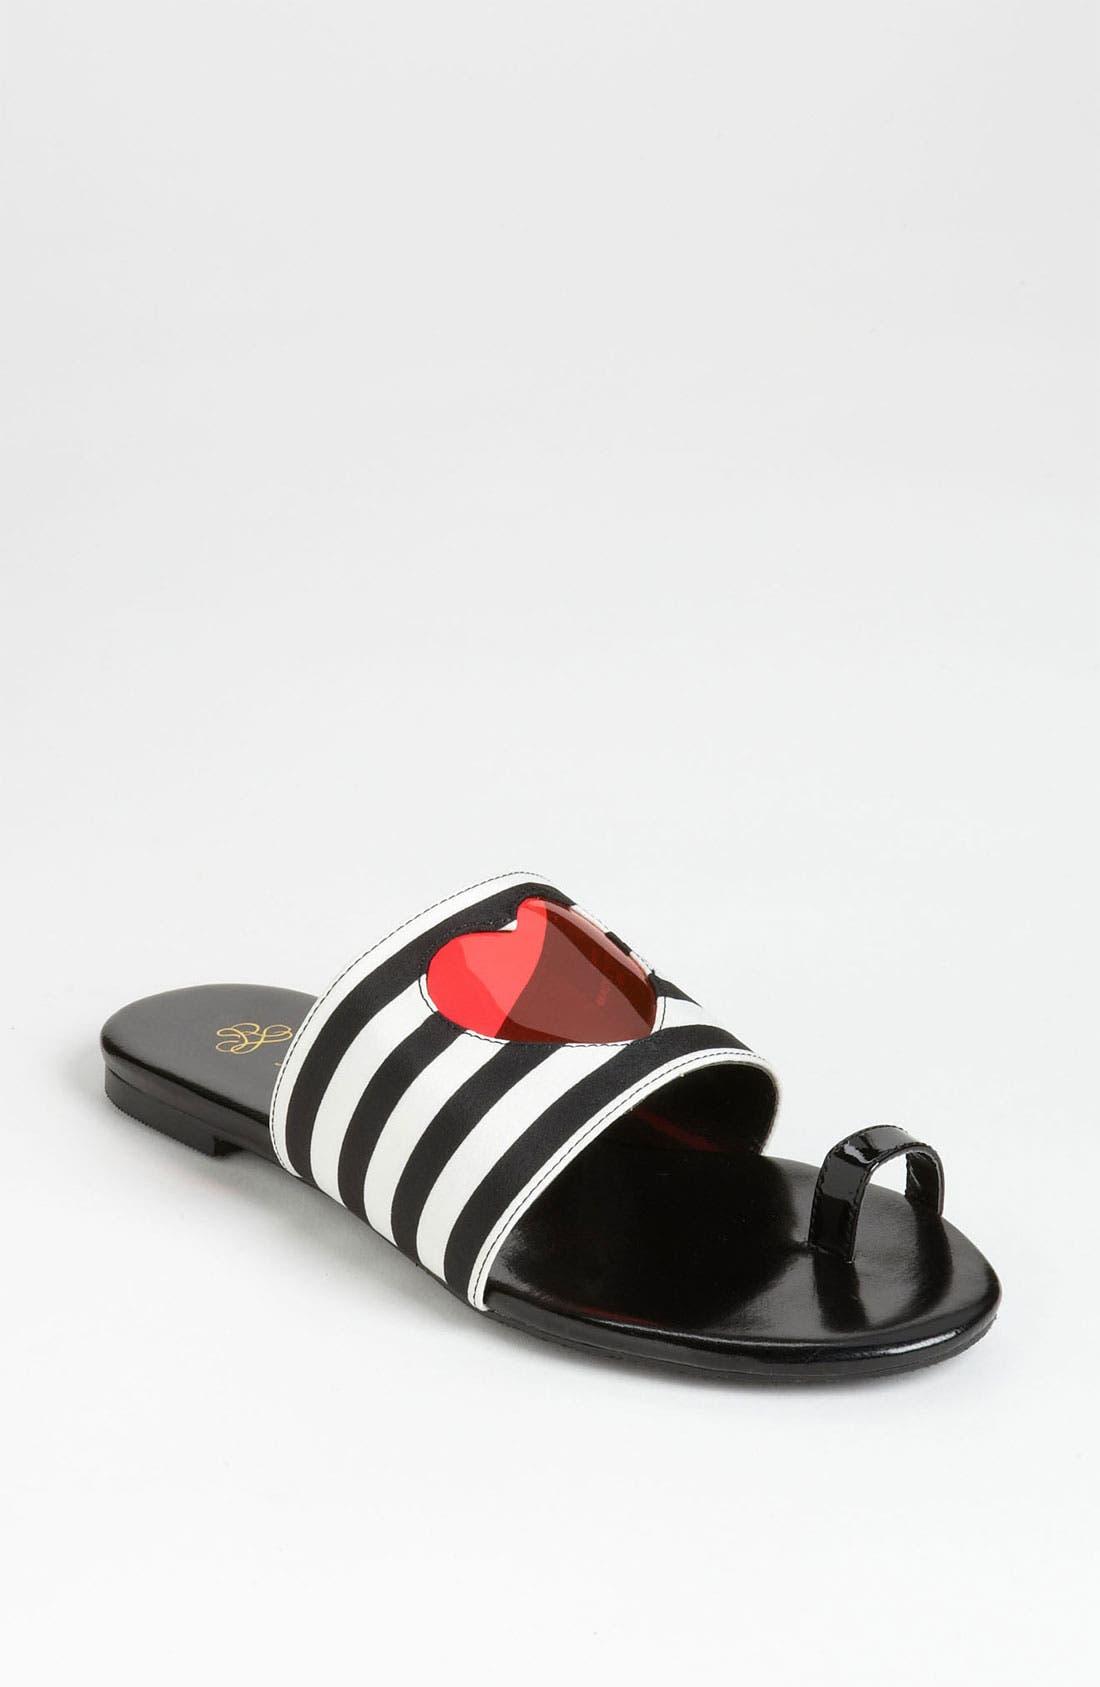 Alternate Image 1 Selected - J. Reneé 'Spry' Sandal